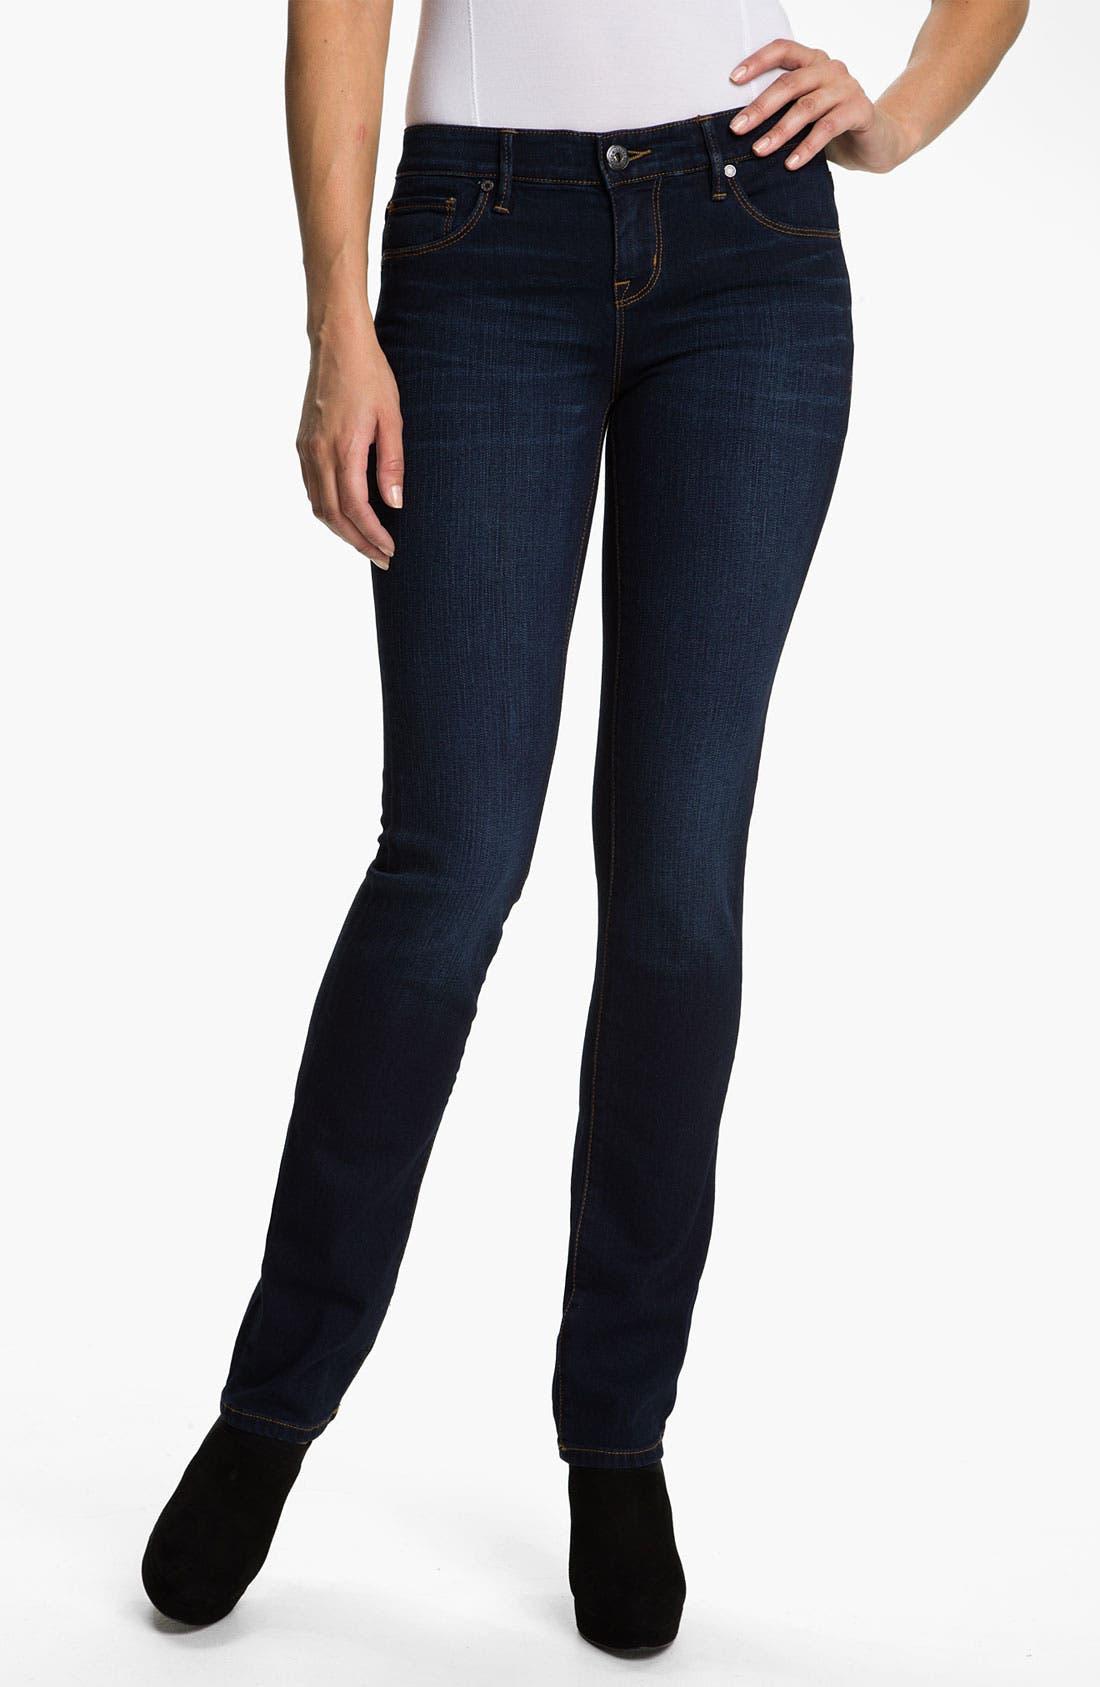 Main Image - Isaac Mizrahi Jeans 'Emma' Straight Leg Jeans (Tribeca Wash)